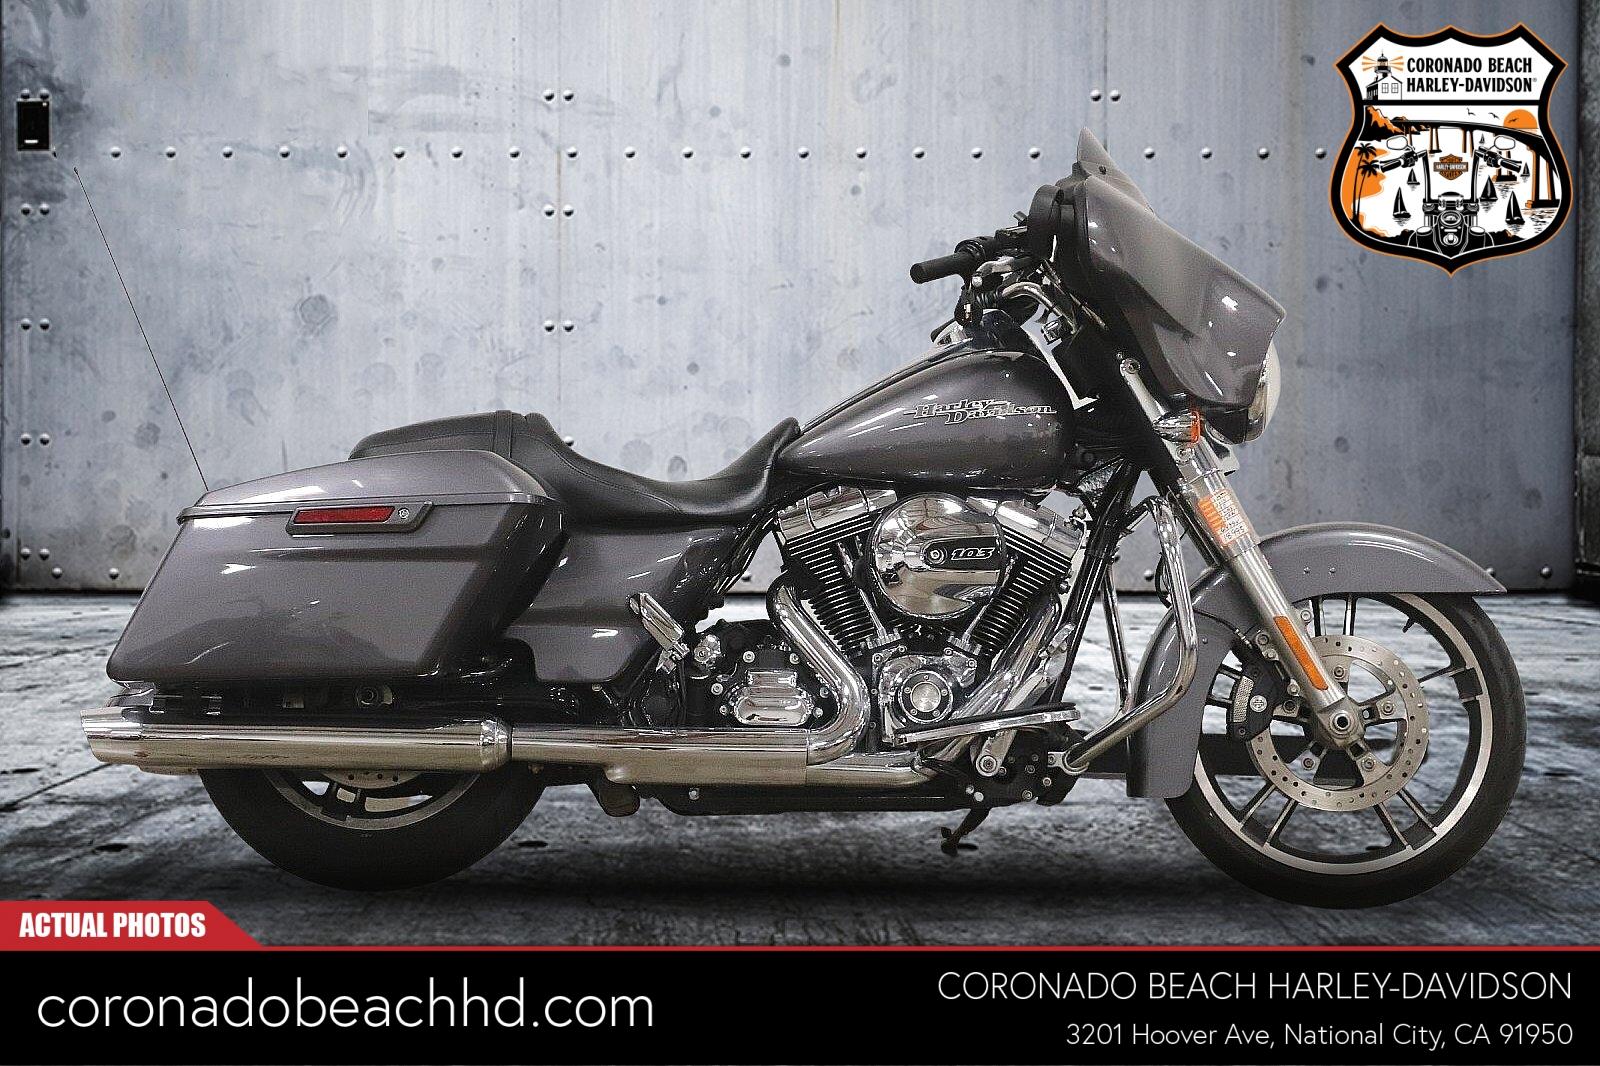 2014 Harley-Davidson Street Glide Special [10]